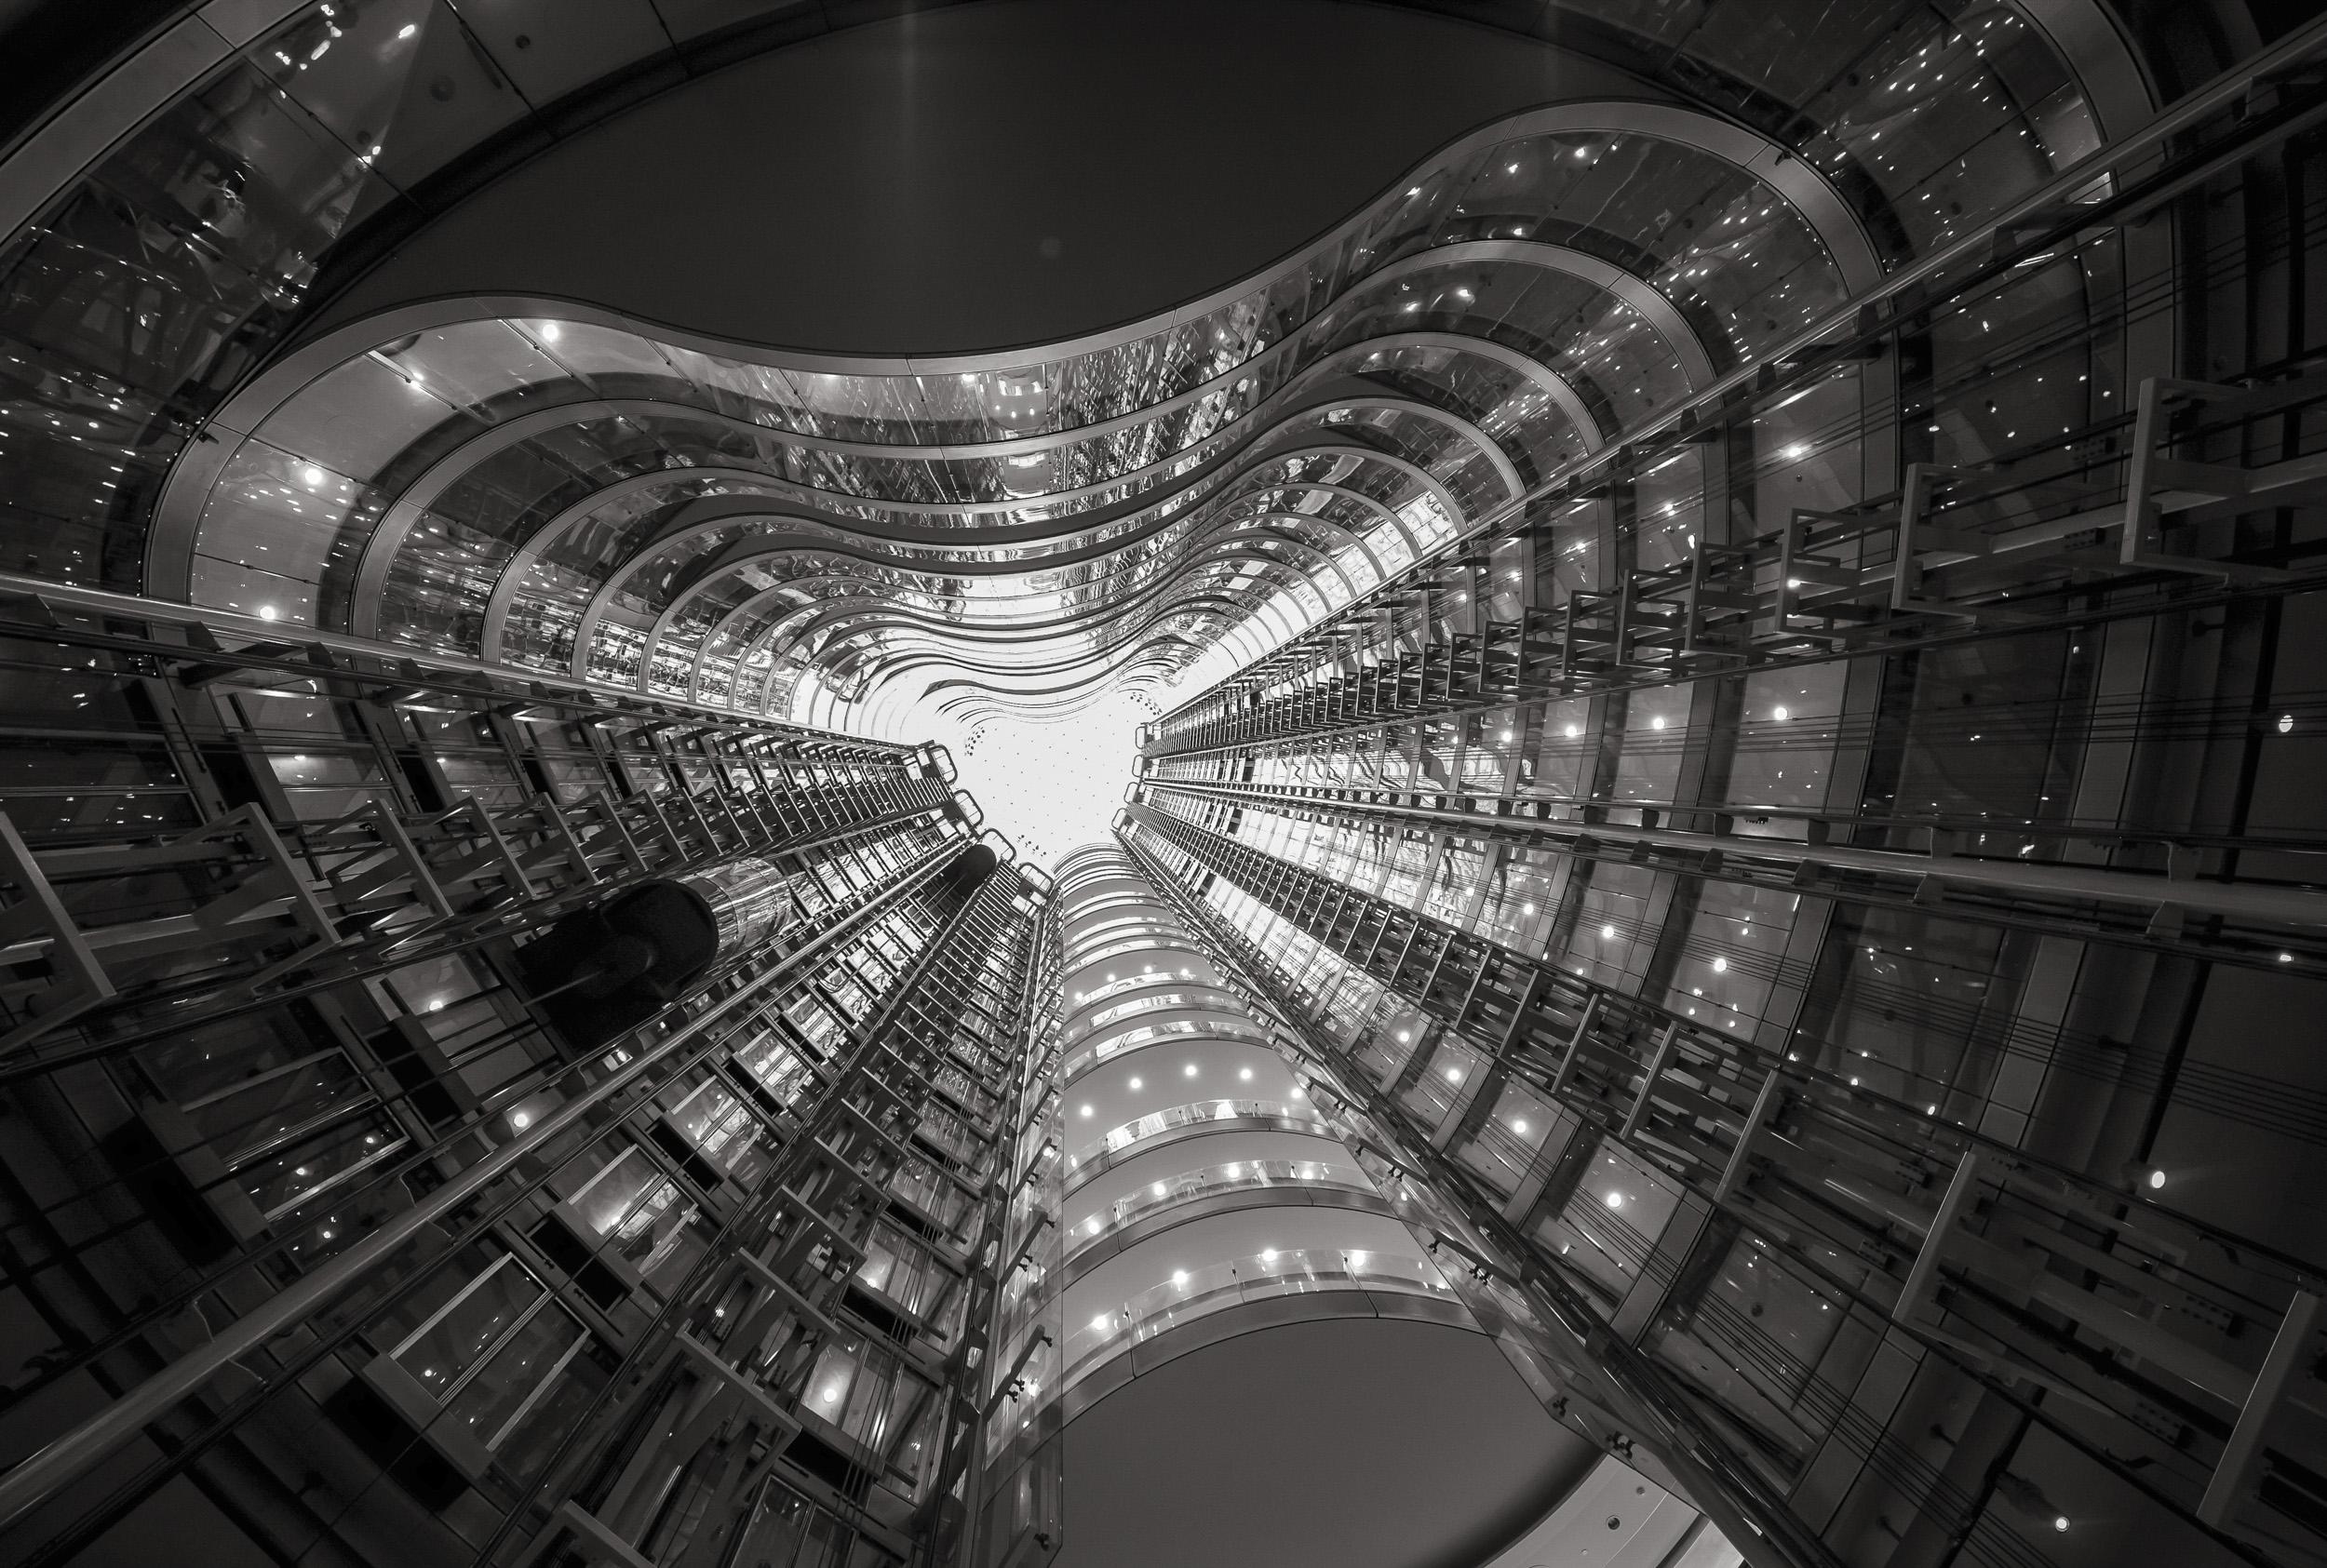 hirise_architecture_sydney_australia_07.jpg